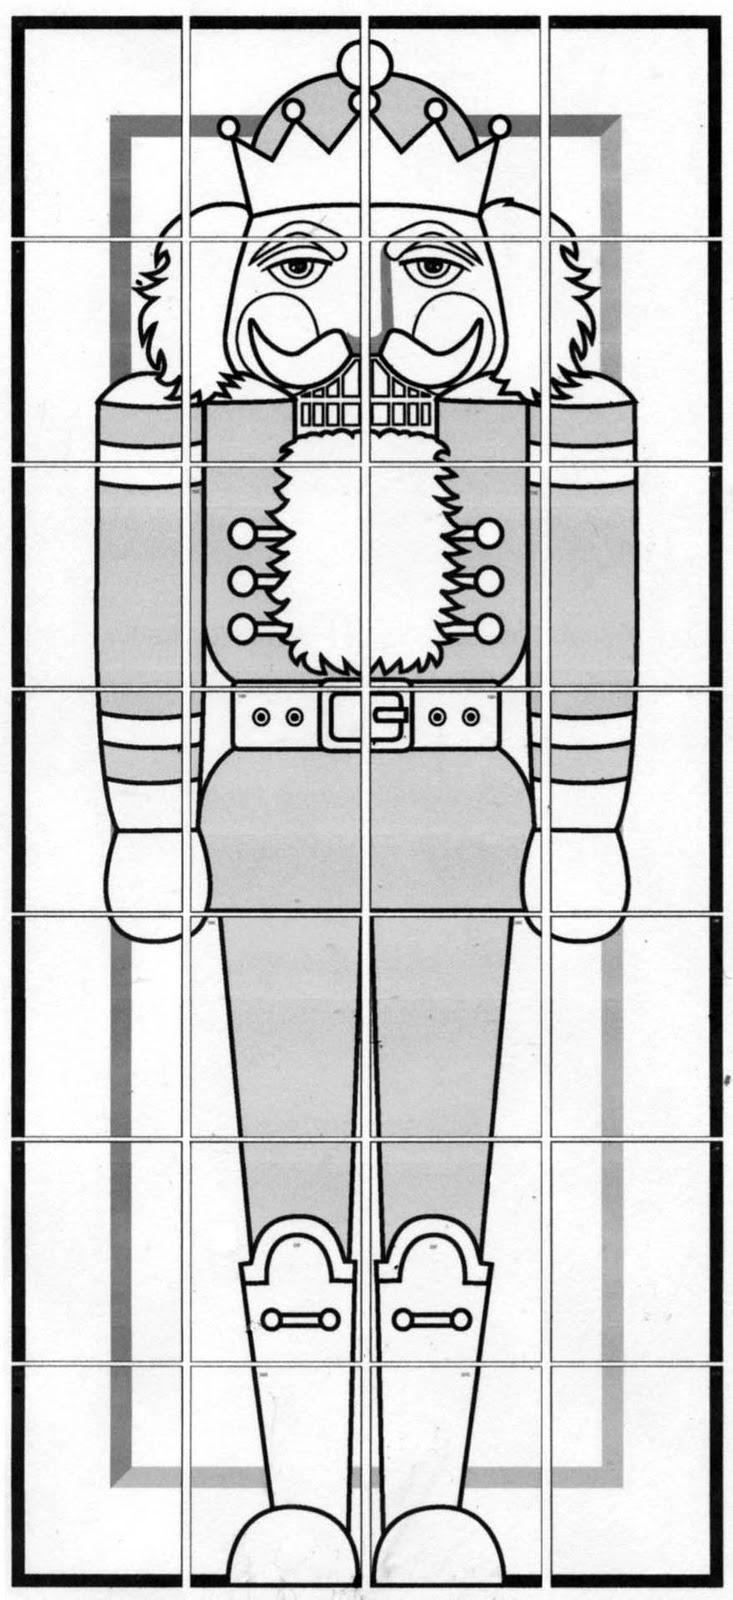 Nutcracker Diagram Art Projects